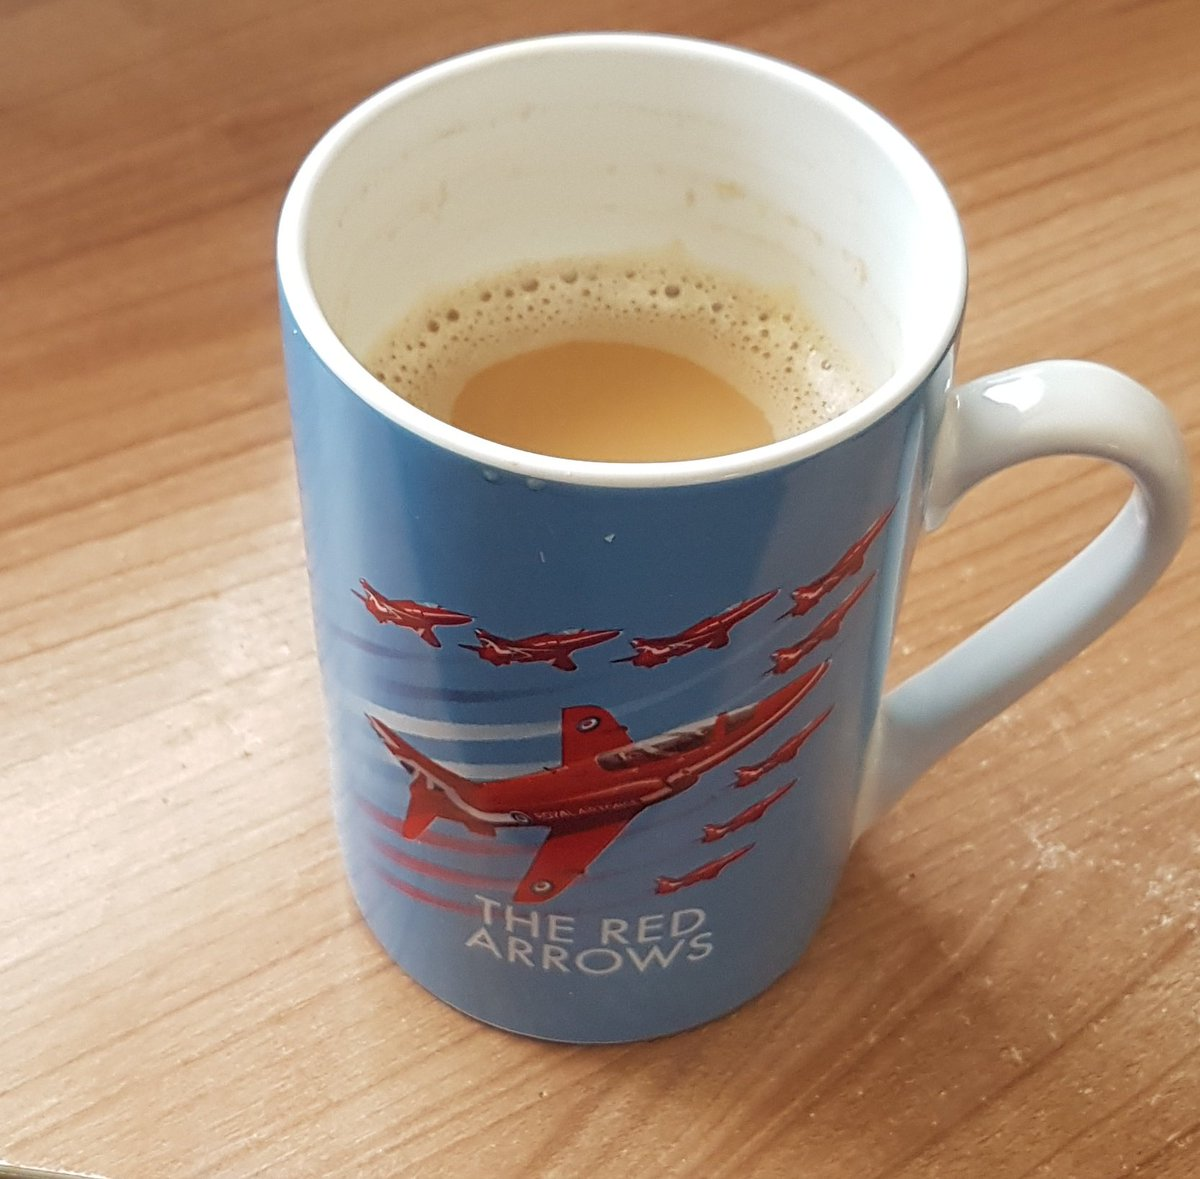 Morning coffee #redarrows @airforcegifts ☕ #FridayFeeling https://t.co/Vtge3tMeH6